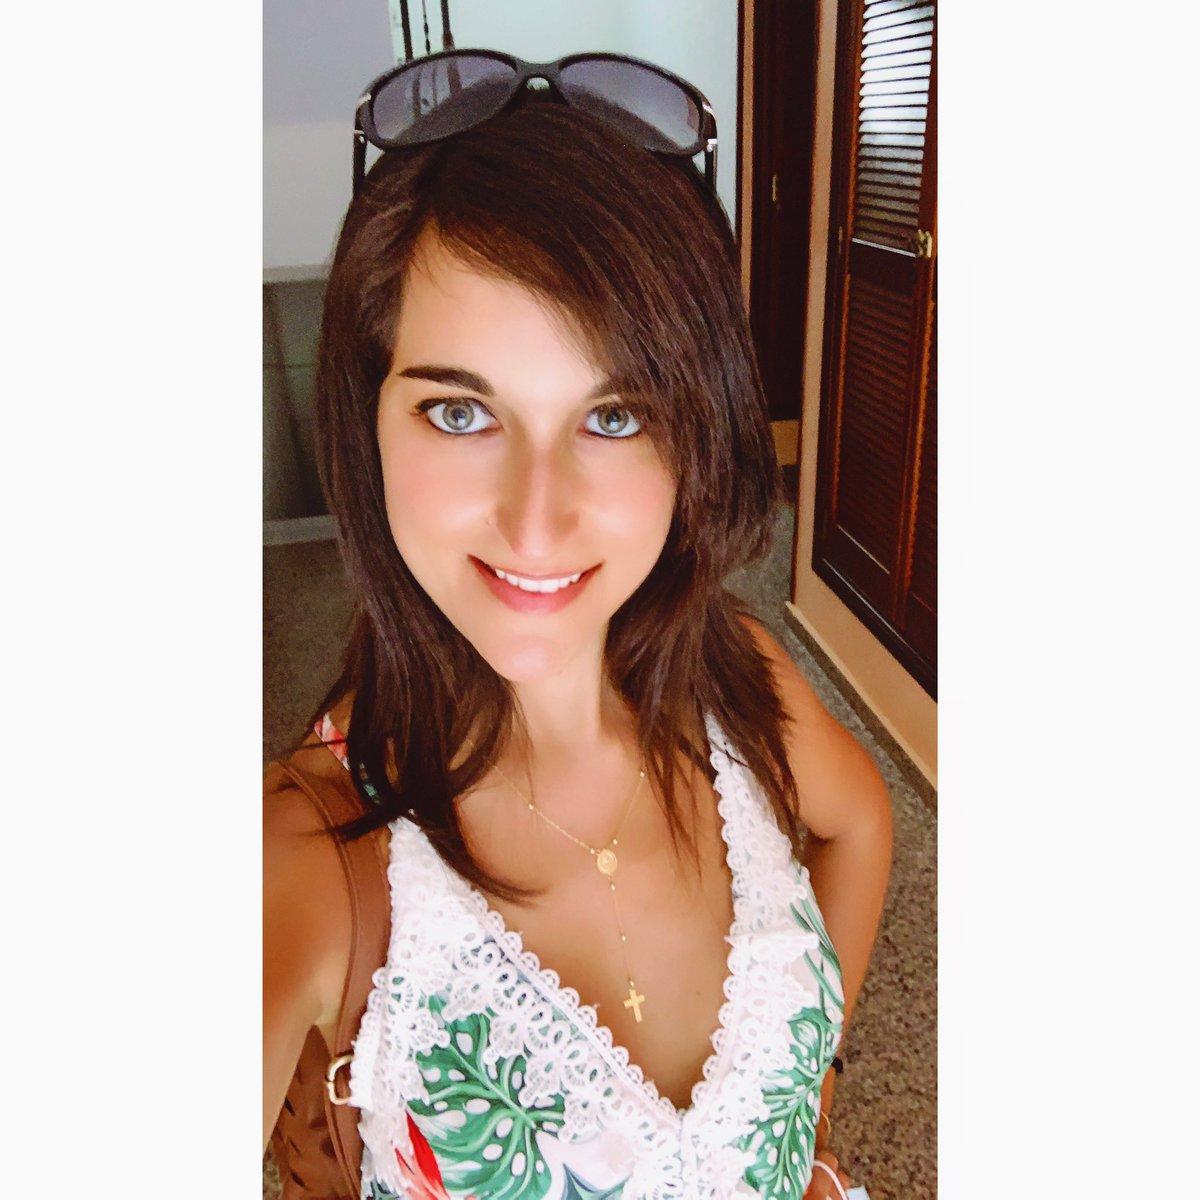 Tropical dress and mood! #InstaSelfie #Selfie #SelfieTime #PicOfTheDay #InstaPic #SelfieLover #Portrait #GreenEyes #Selfiegram #SelfieDay #InstaLook #EyesOfTheDay #PhotoOfTheDay #Myself #MySelfie #SelfieMania  http://instagram.com/p/CDo9SZio6va/pic.twitter.com/mIcUKVmPAE